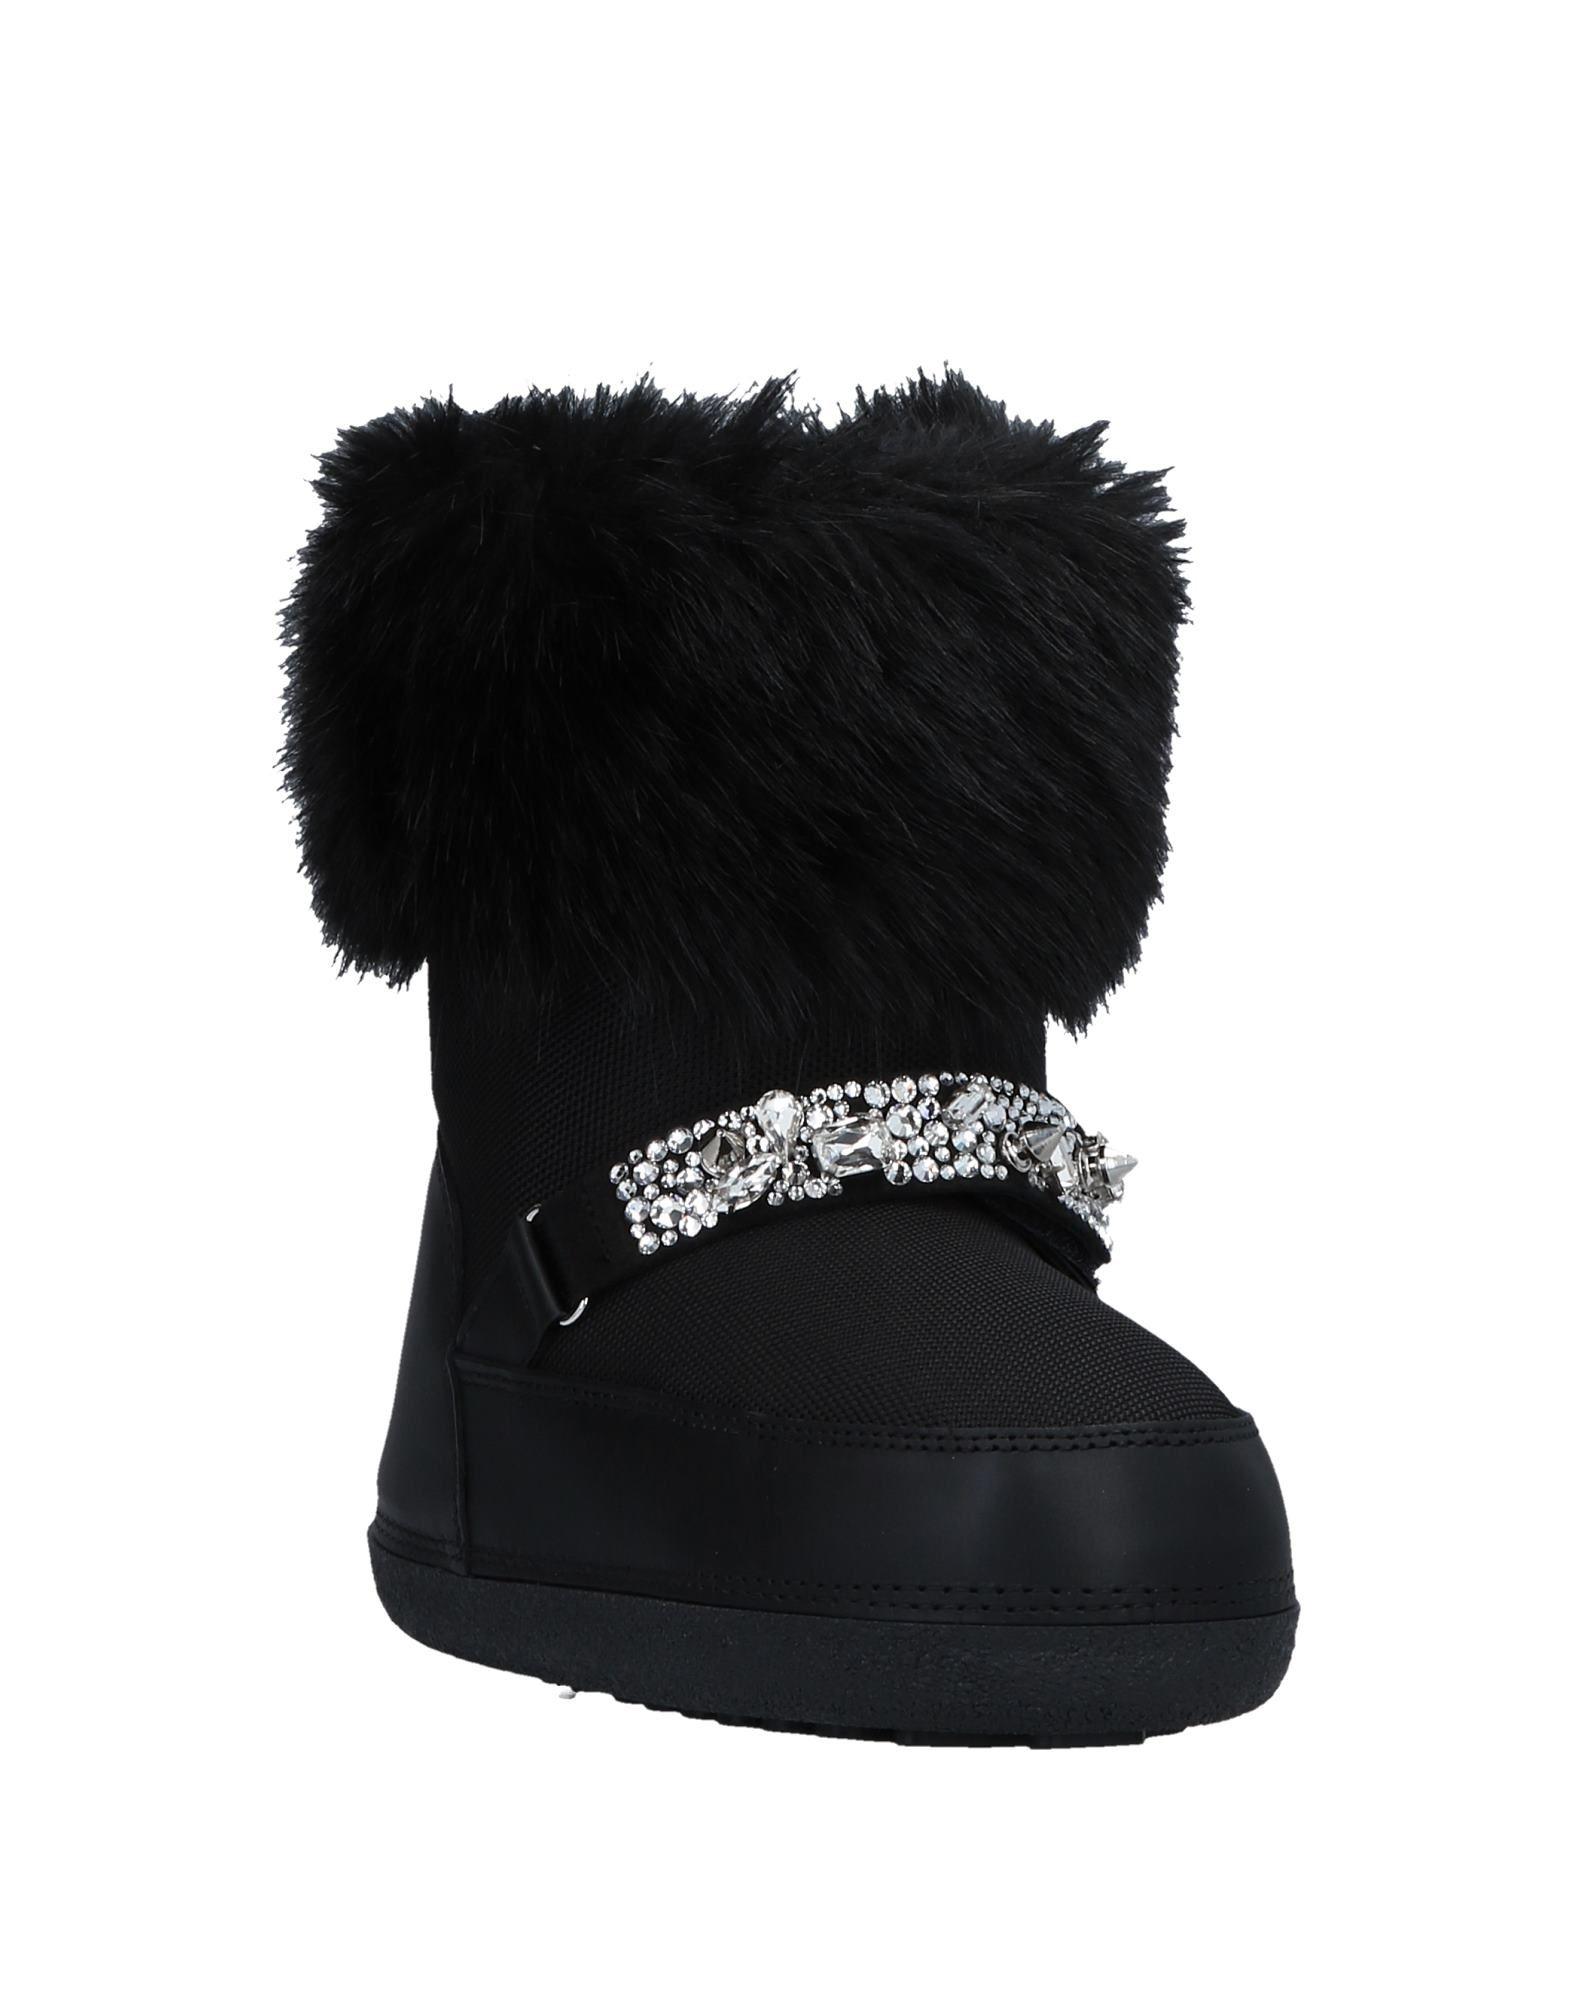 Giuseppe Zanotti Stiefelette Damen Schuhe  11514419ONGünstige gut aussehende Schuhe Damen a7cacb